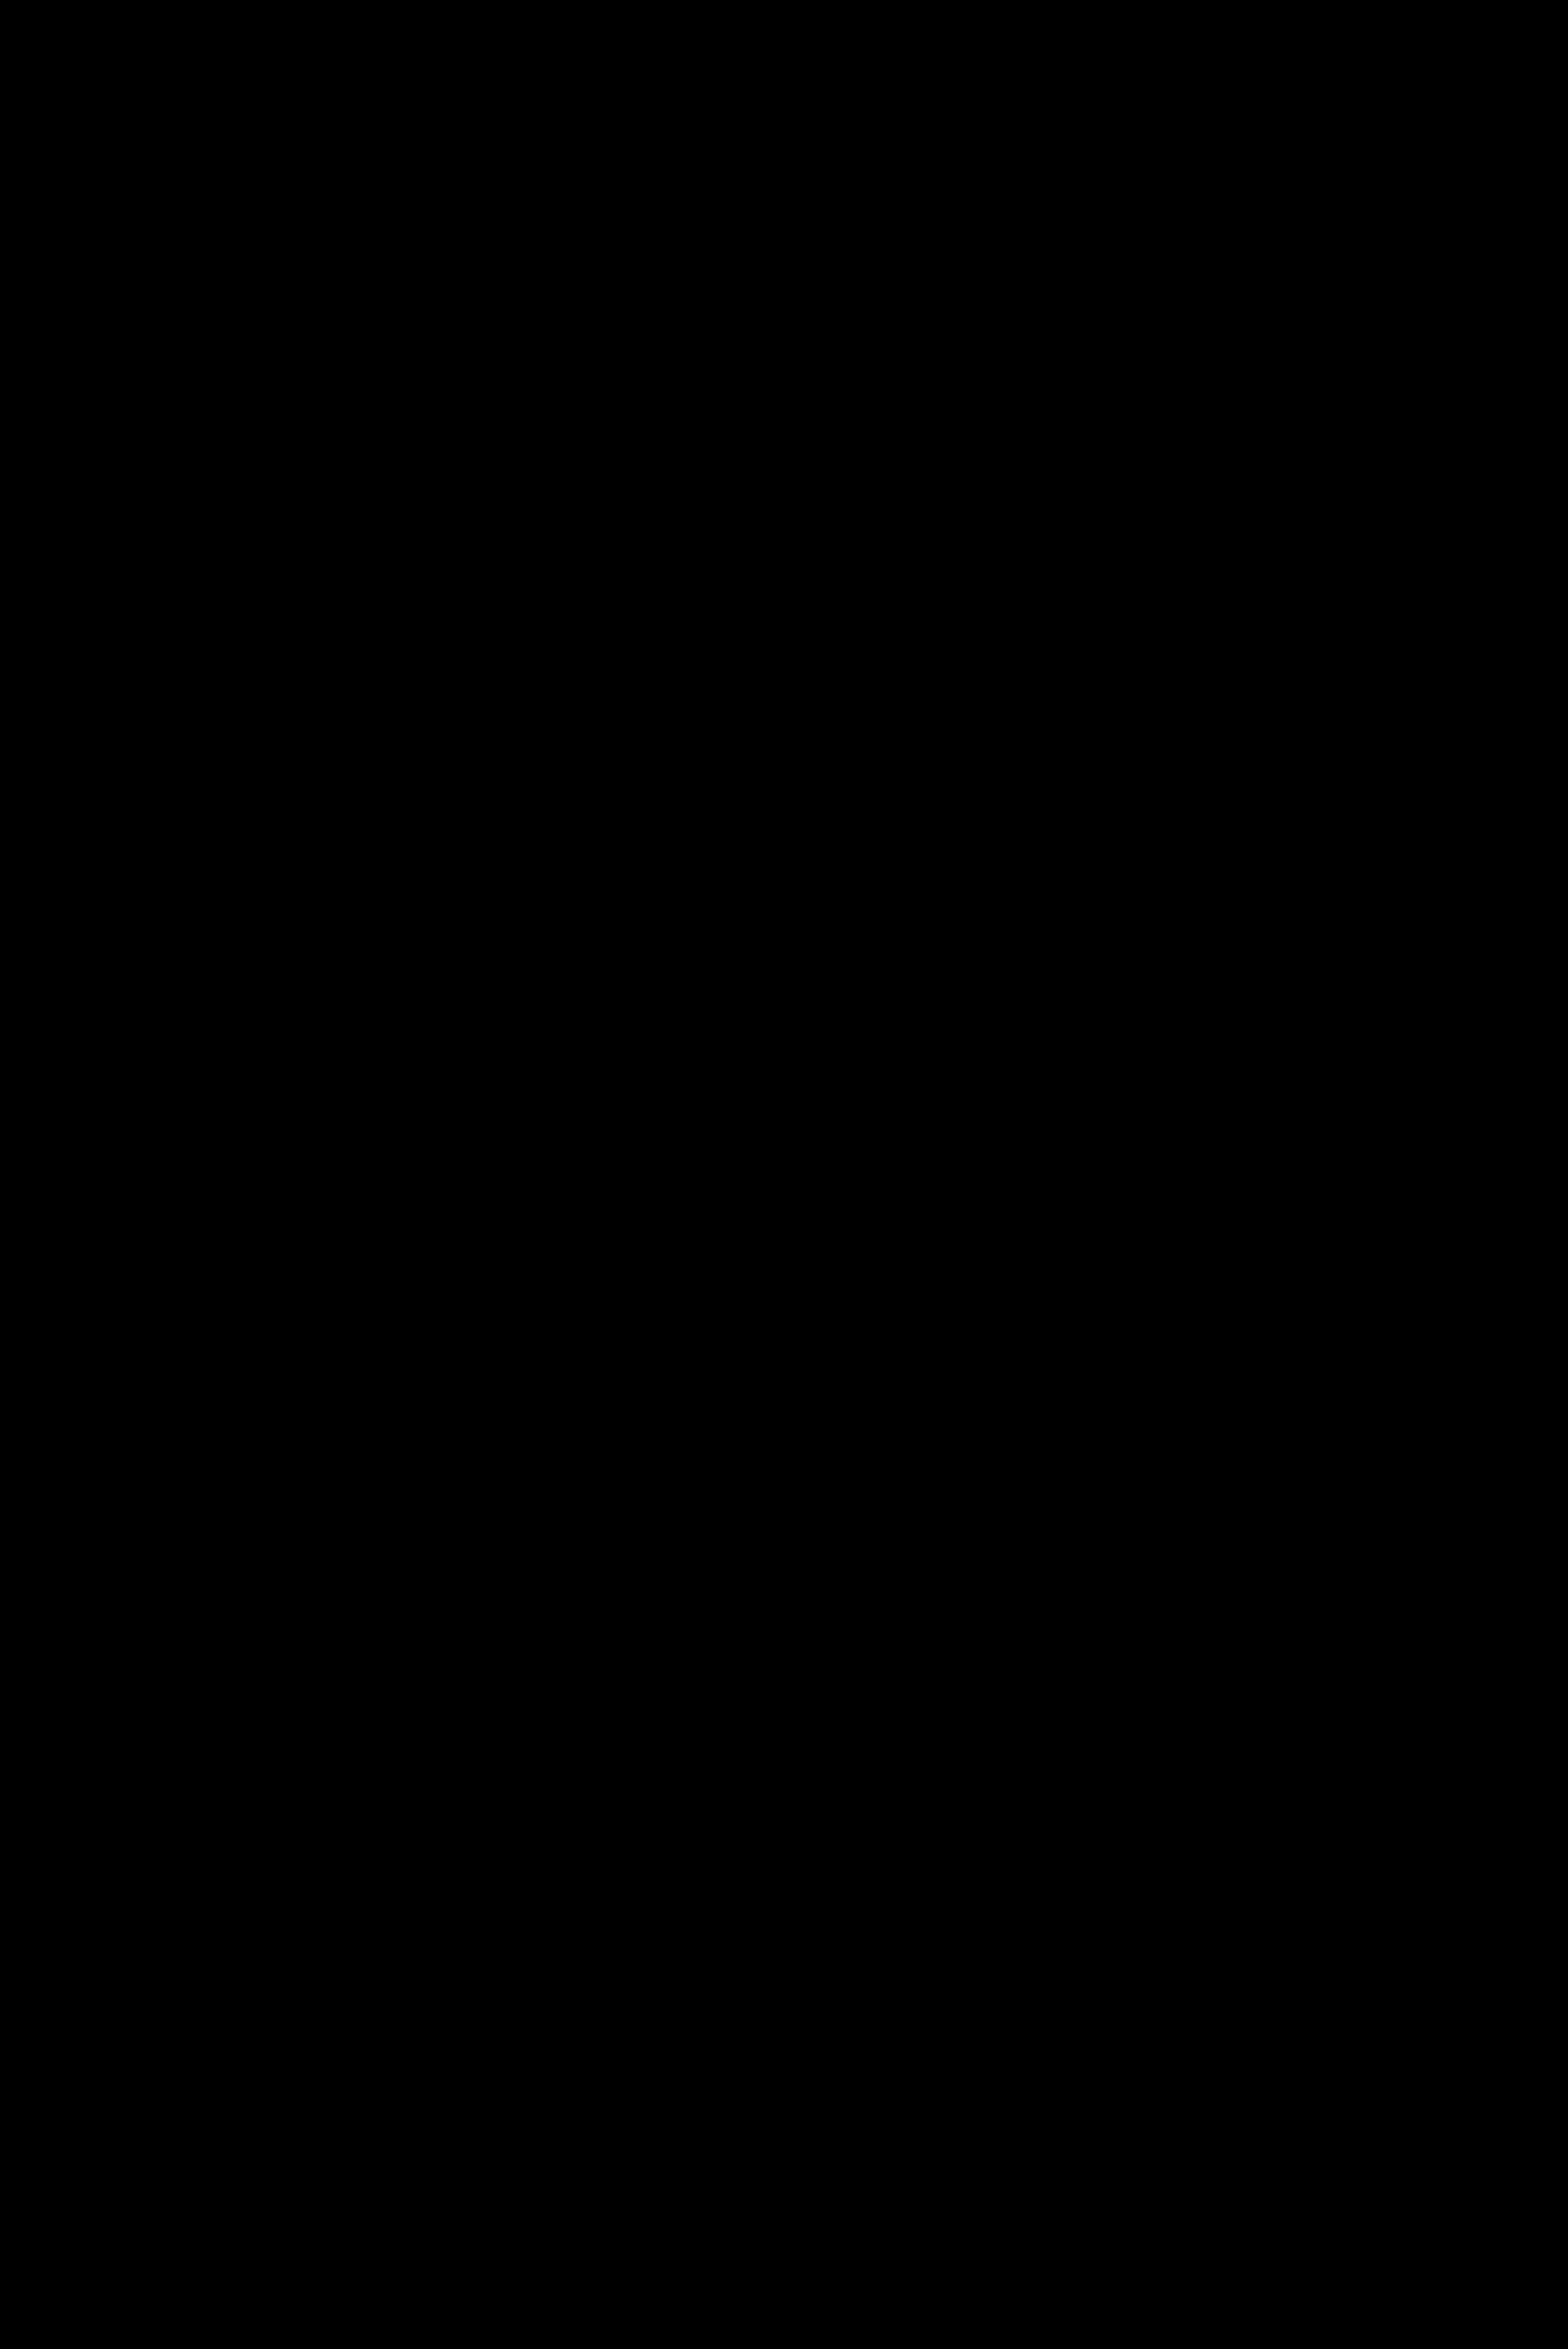 1133-065lindamswope